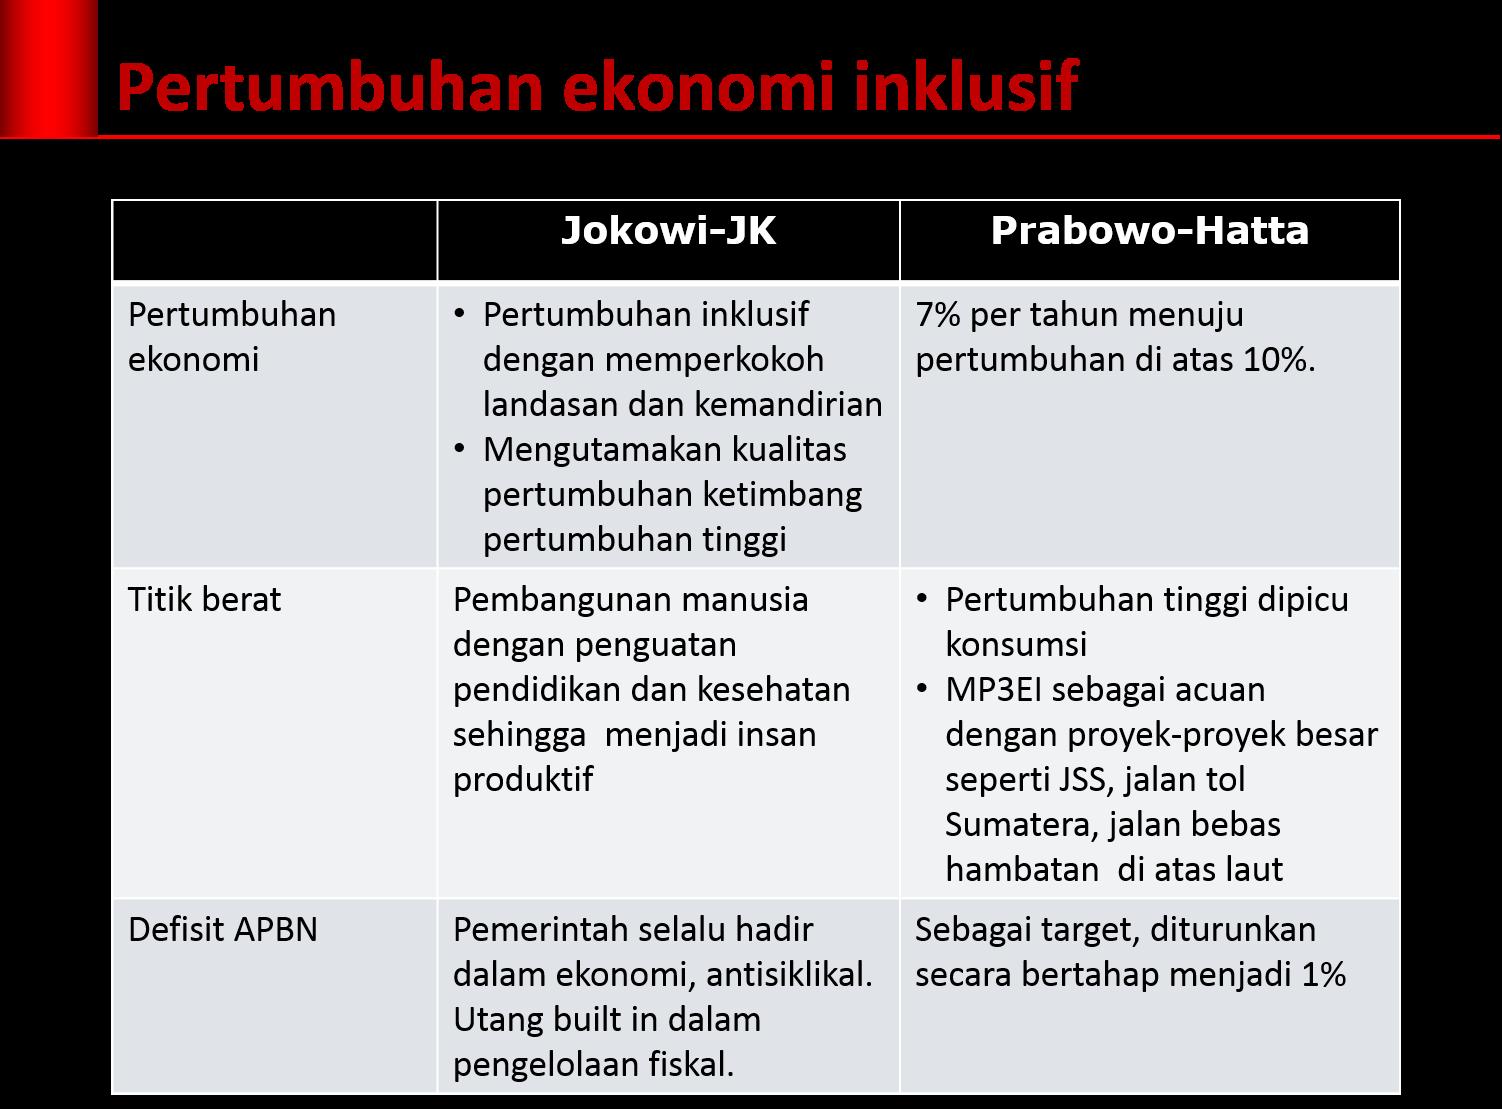 avisi1